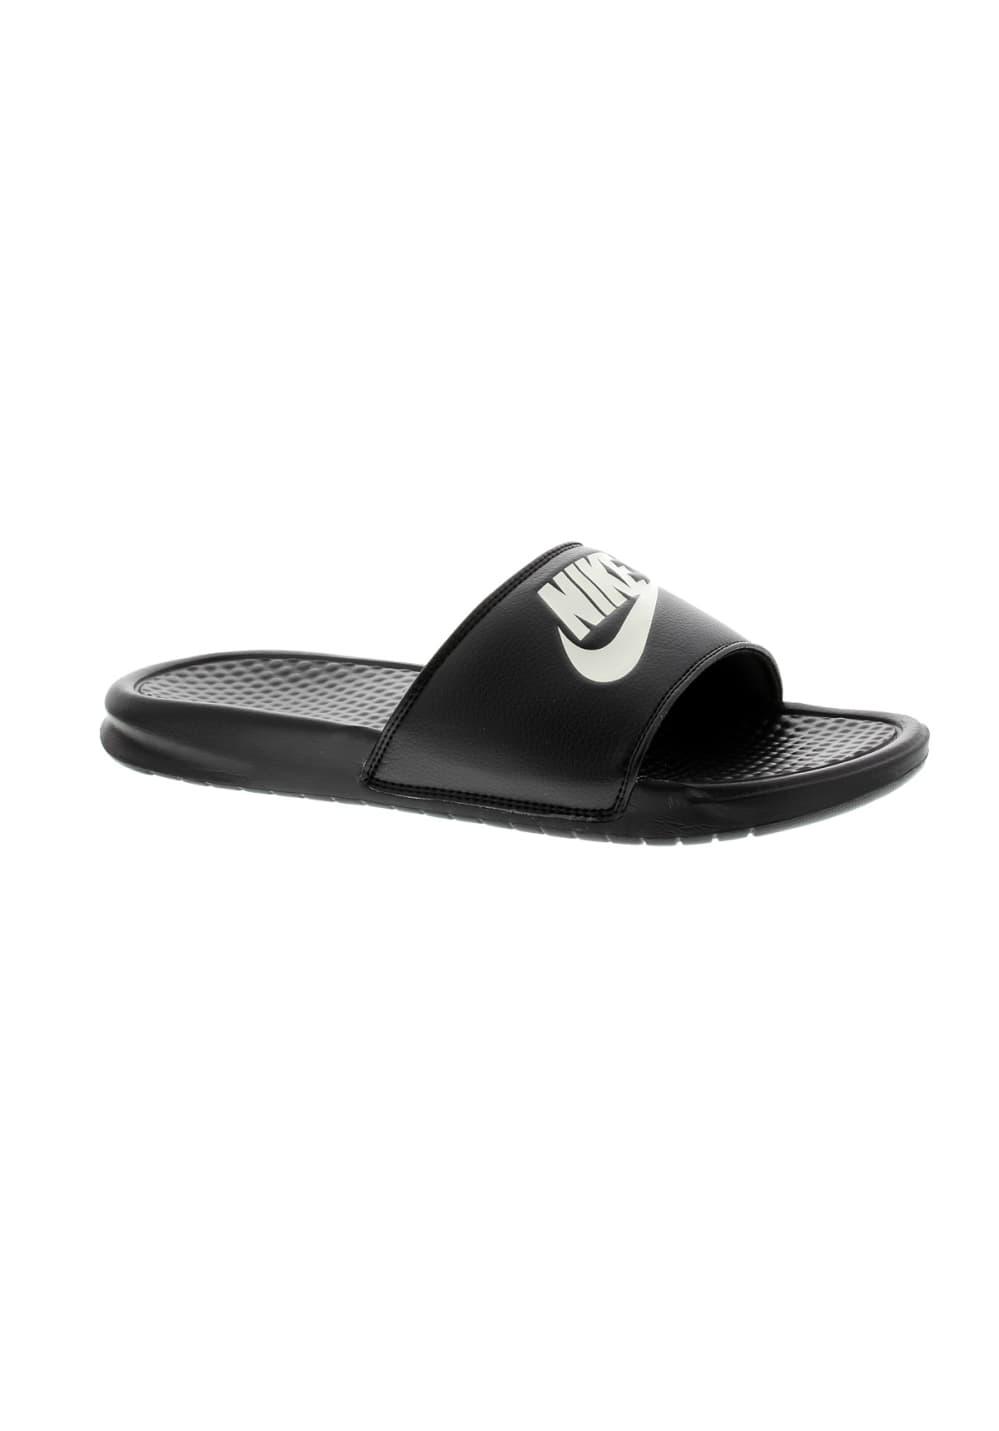 best deals on cb715 31677 Nike Benassi JDI - Tongs pour Homme - Noir   21RUN